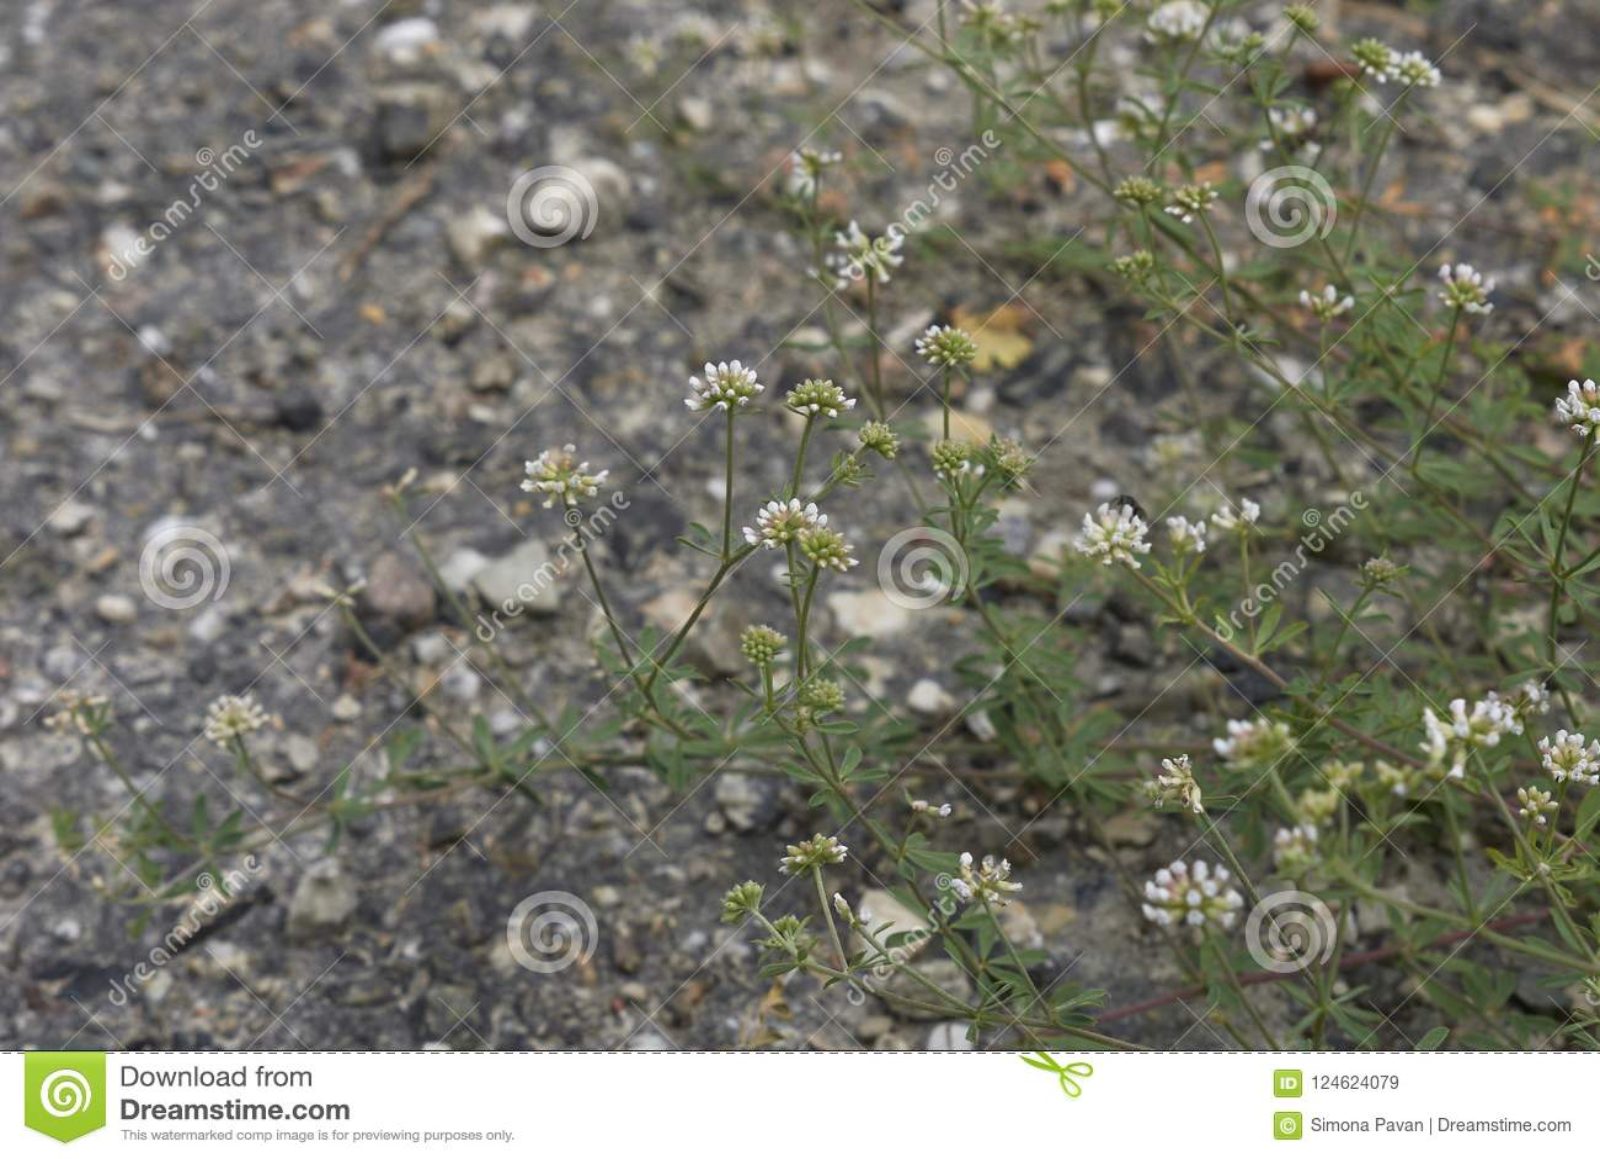 White tiny flowers of dorycnium pentaphyllum plant stock image download white tiny flowers of dorycnium pentaphyllum plant stock image image of perennial flower mightylinksfo